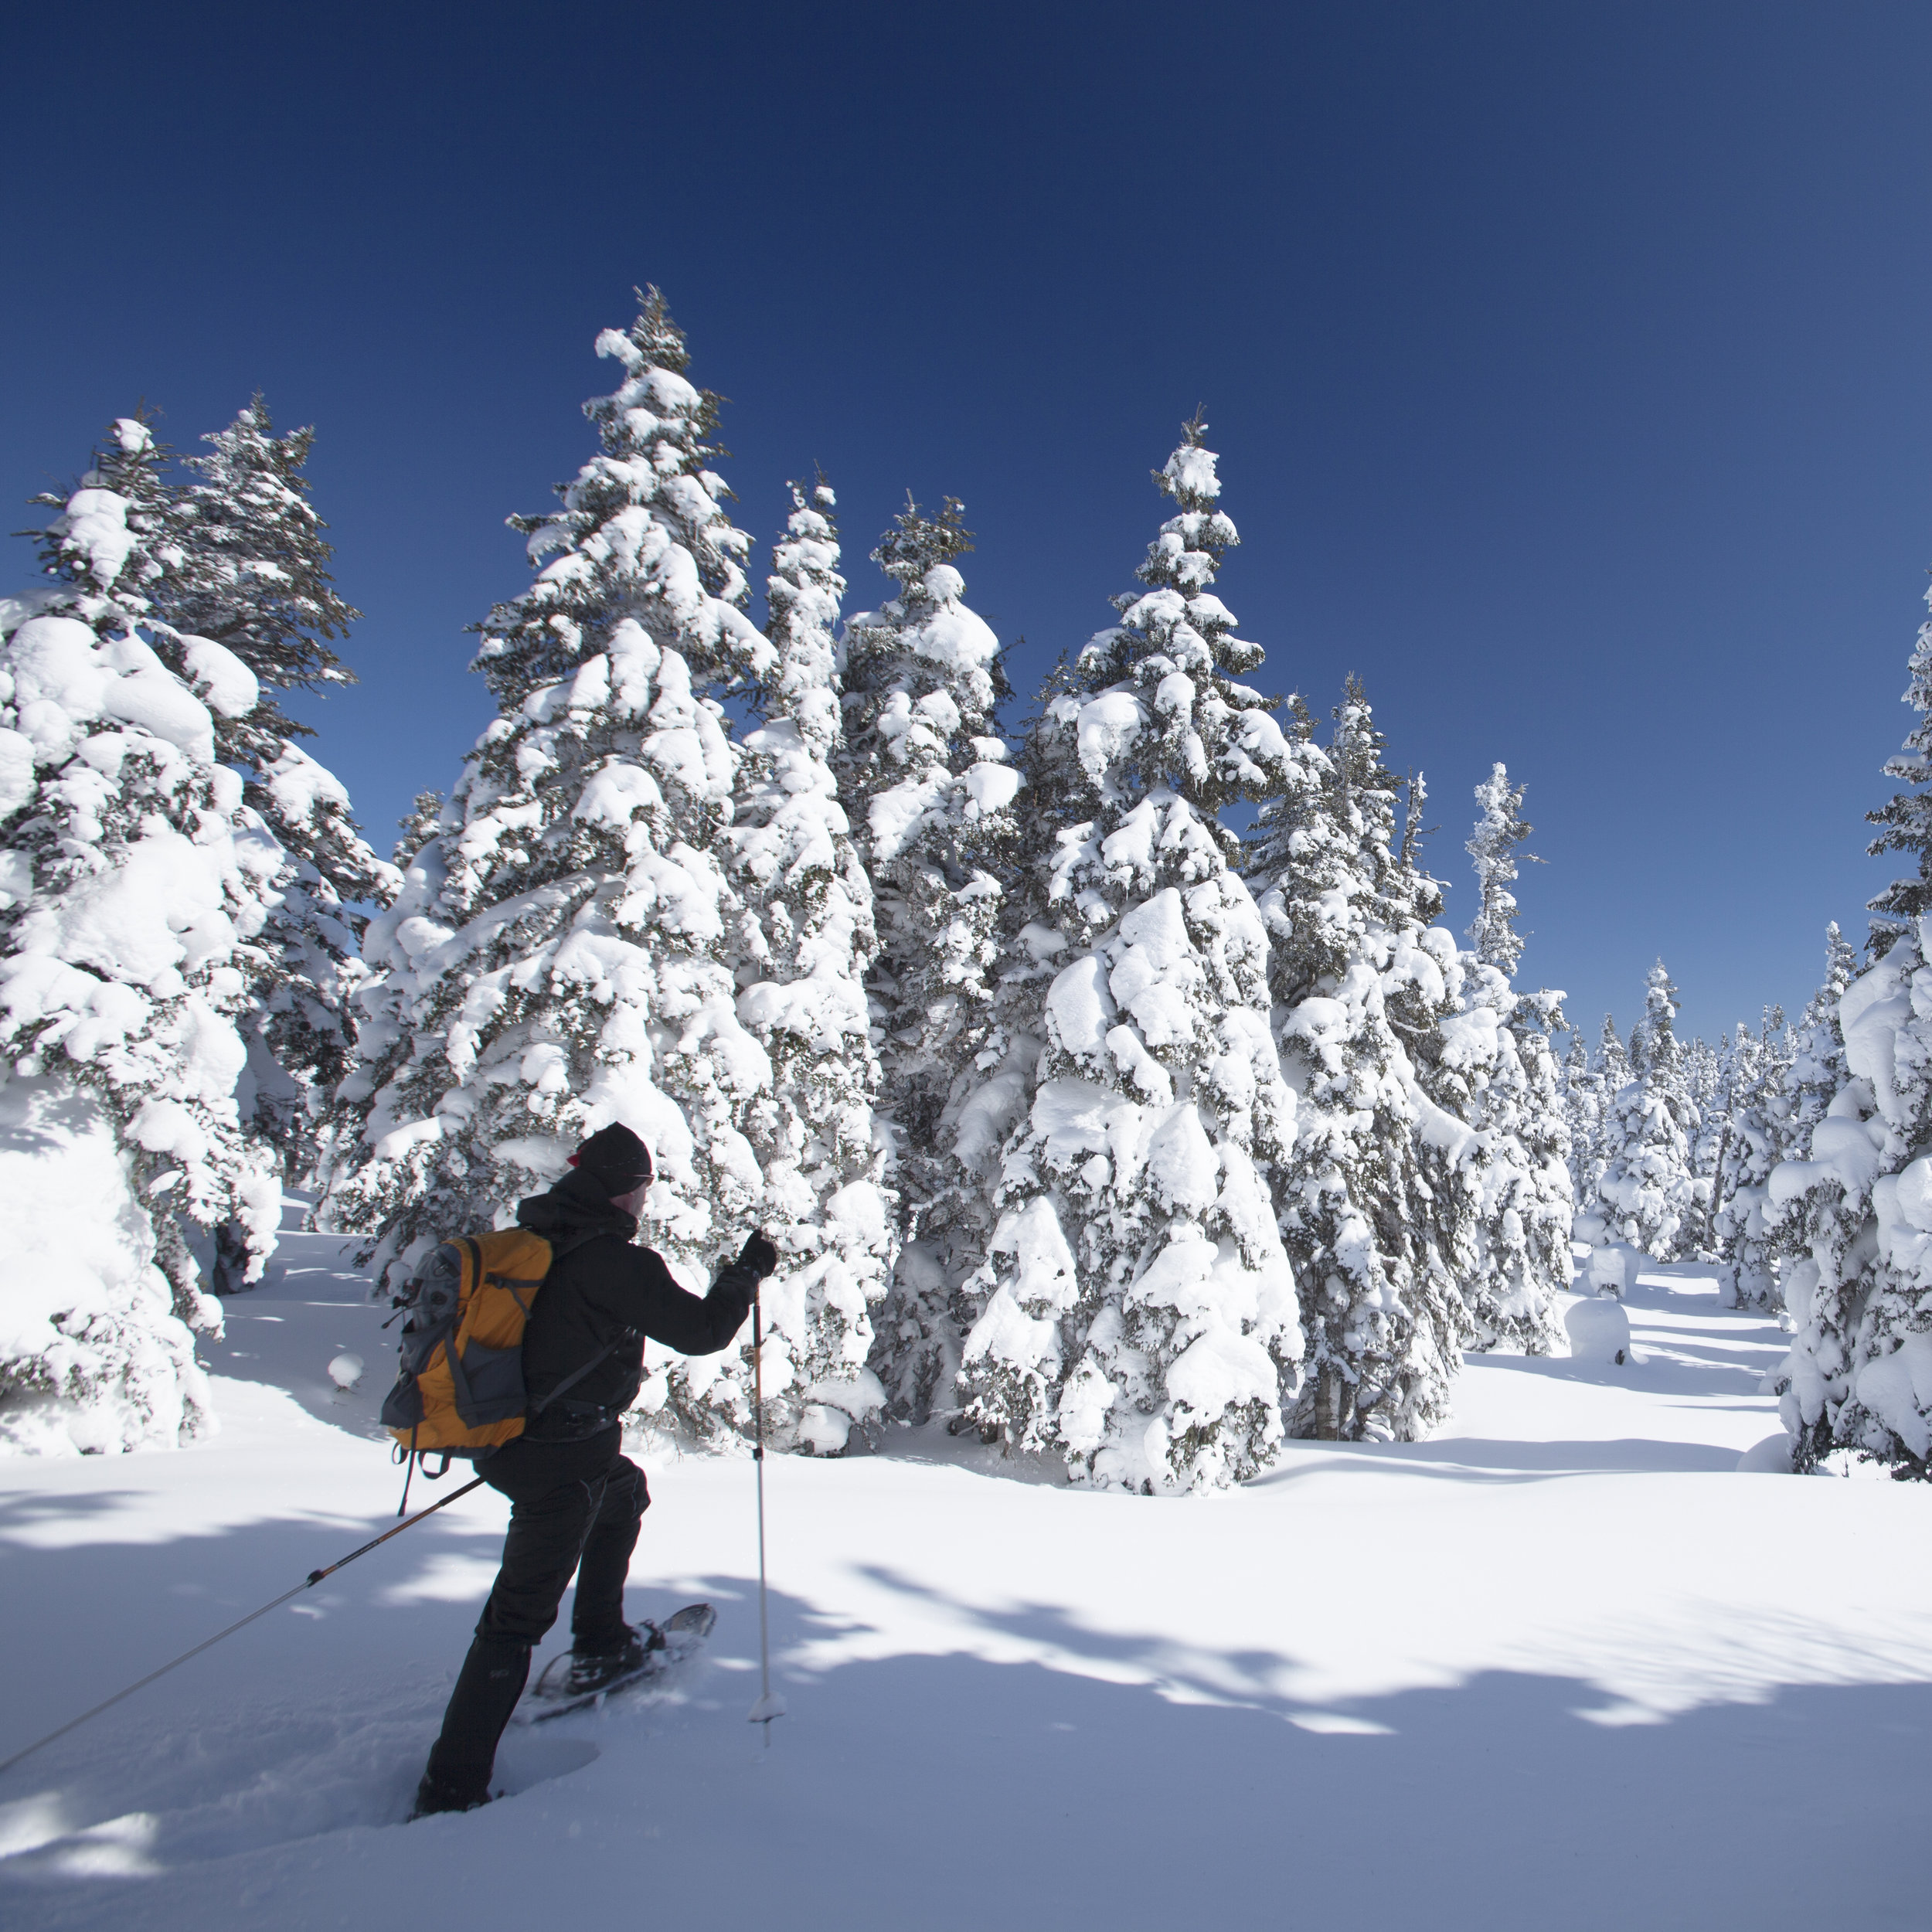 Ski - Association des stations de ski du Québec